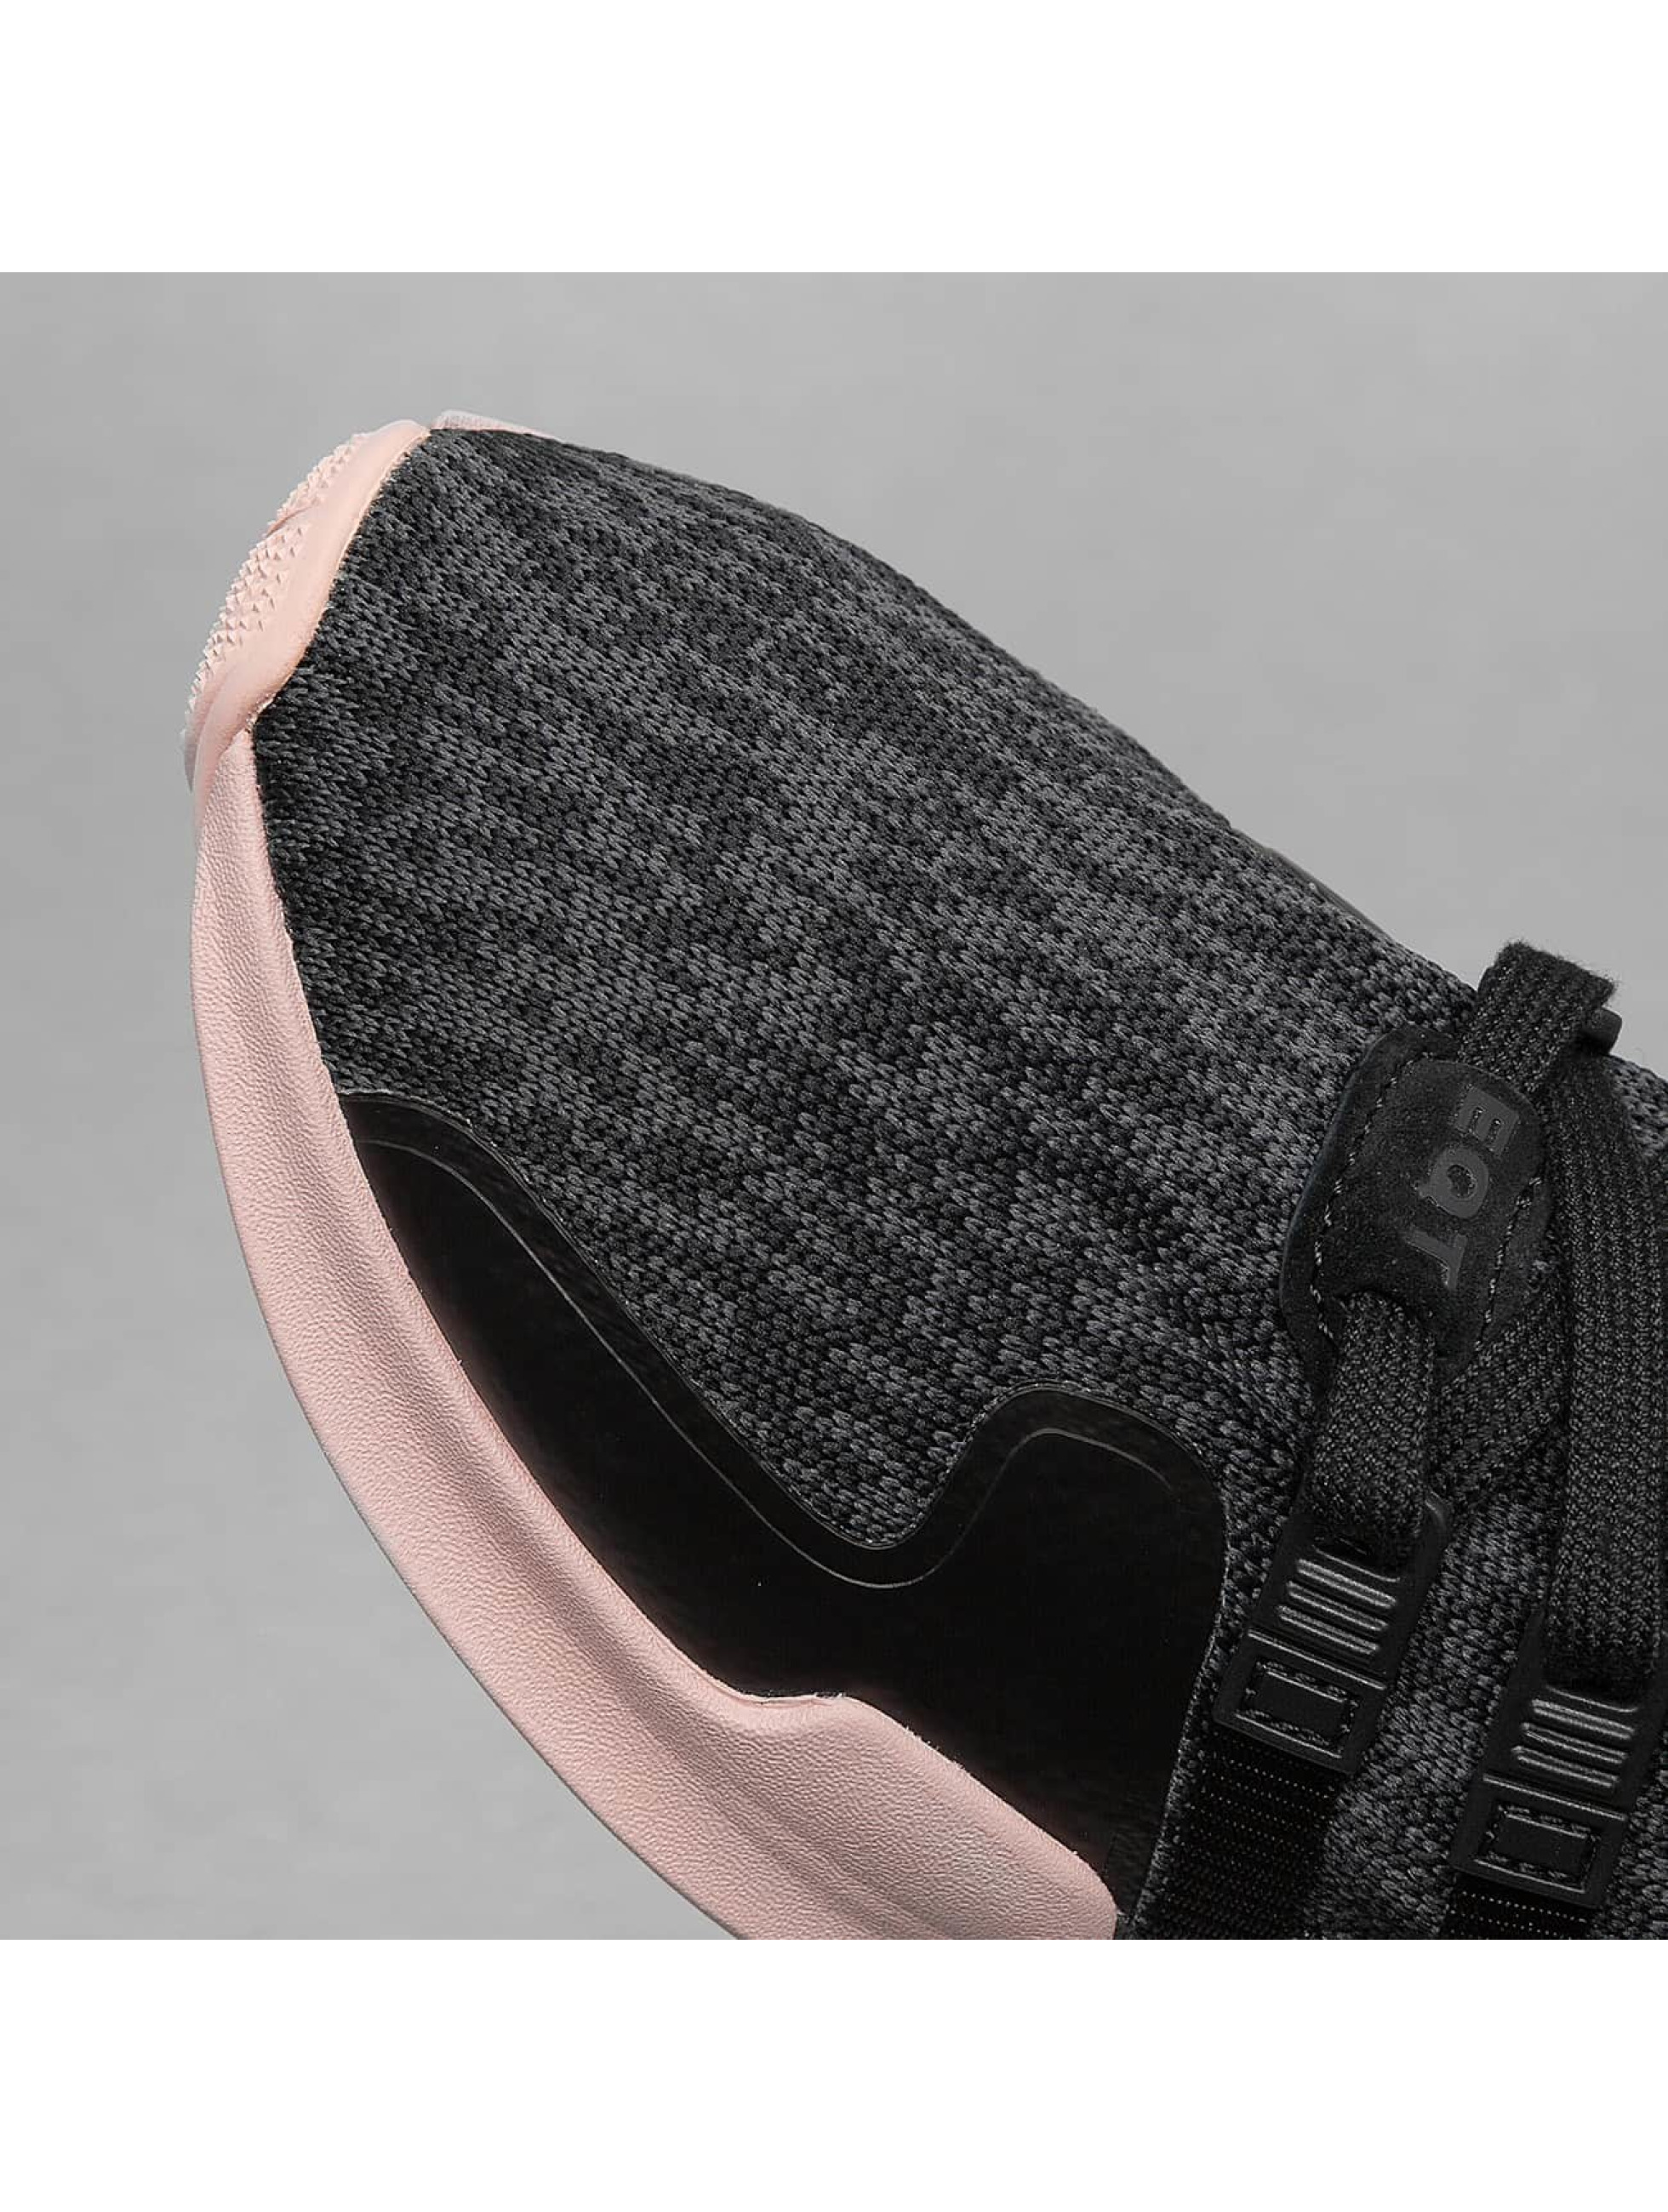 adidas Baskets Equipment Support ADV W noir